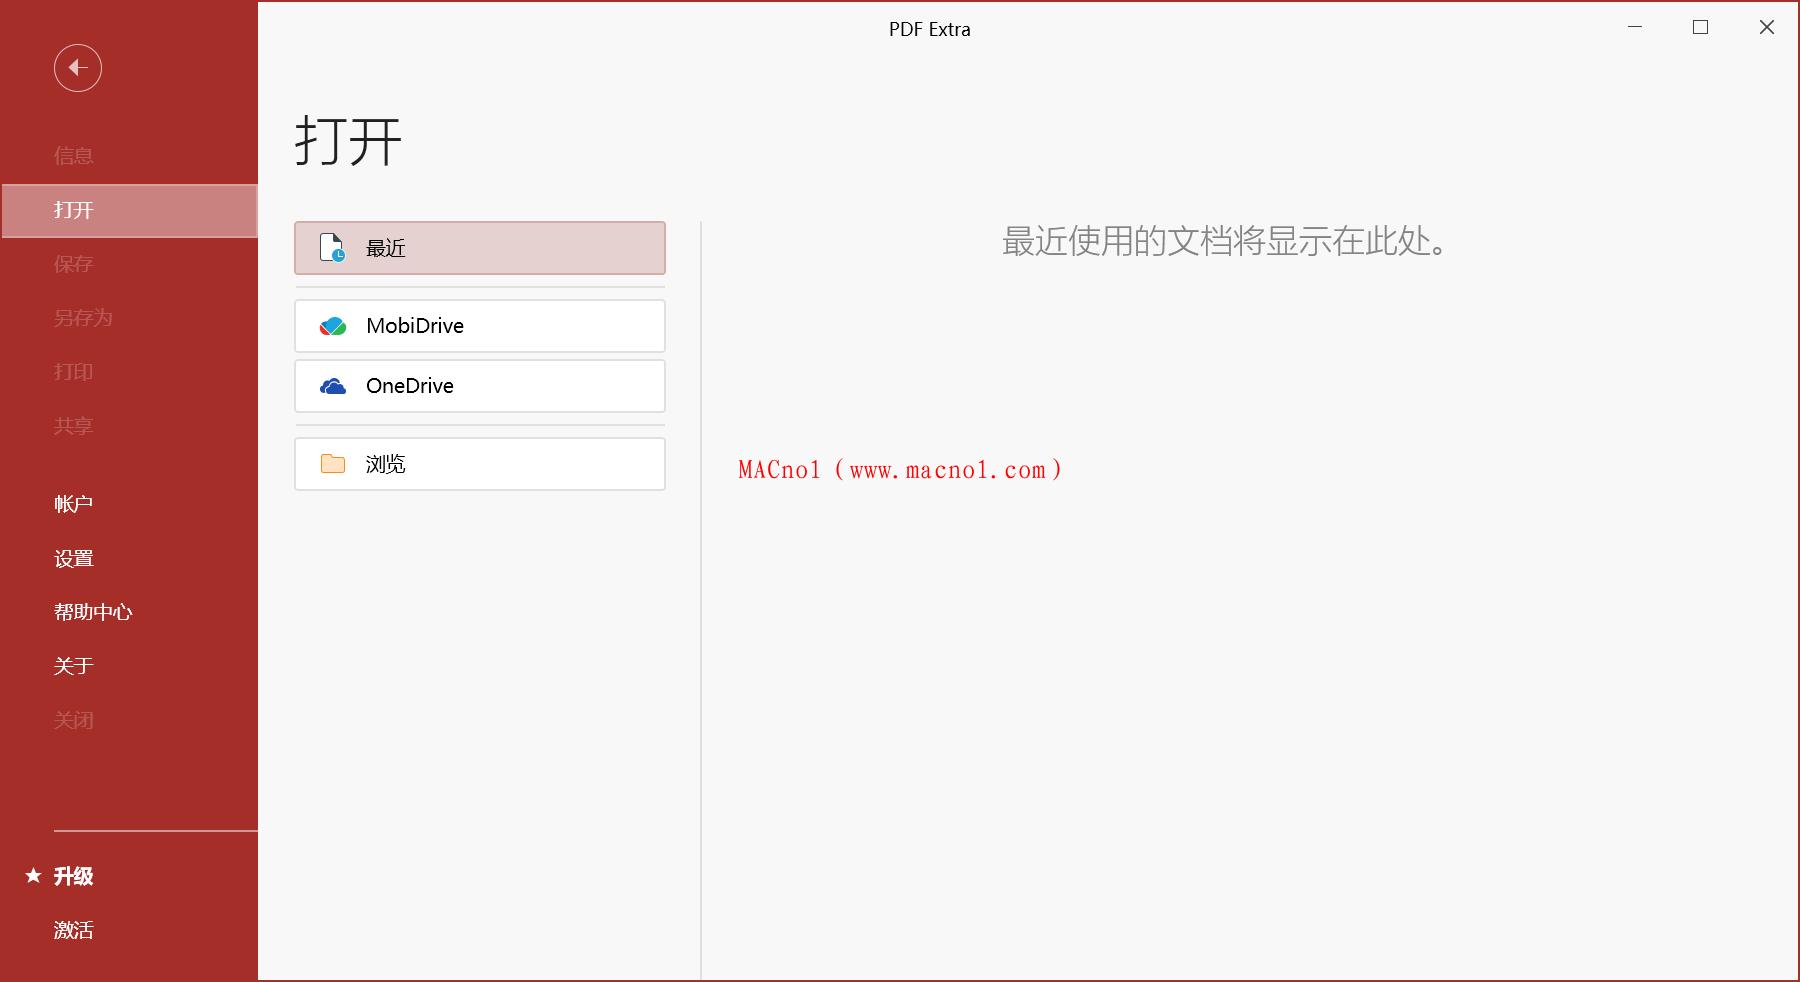 PDF Extra 4.png